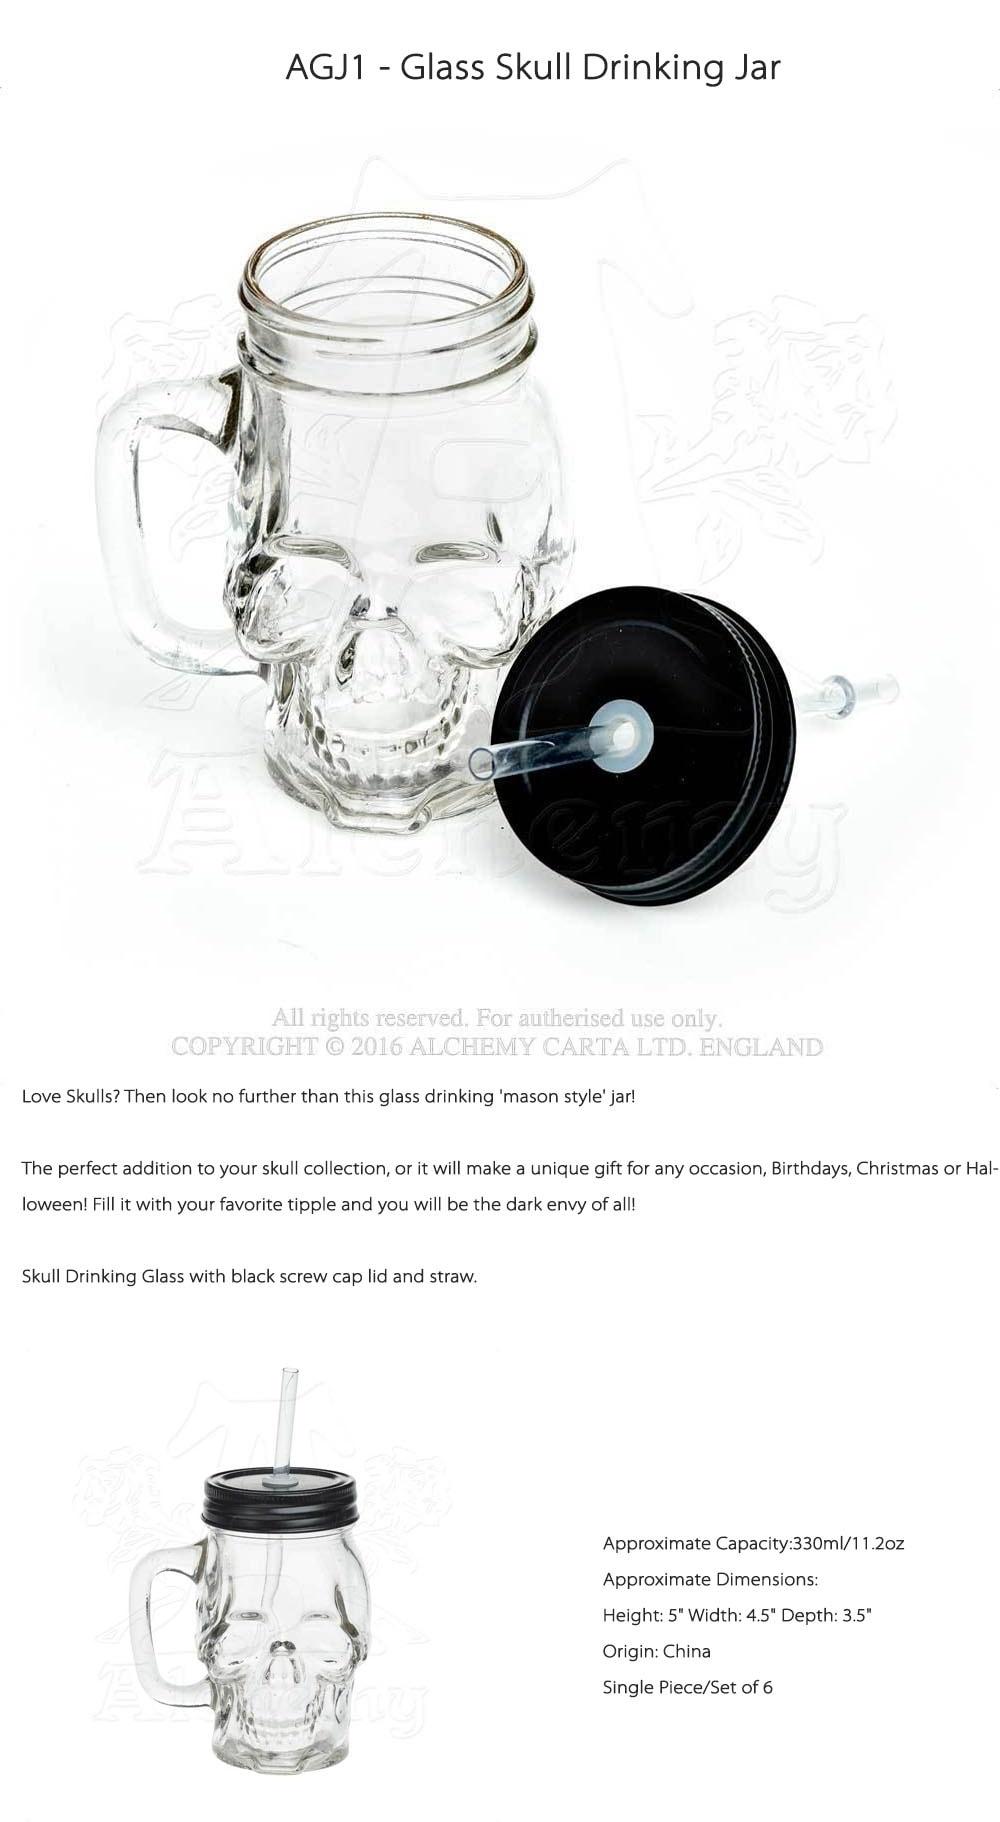 Smiling Skull Glass Drinking Jar from Apollo Box